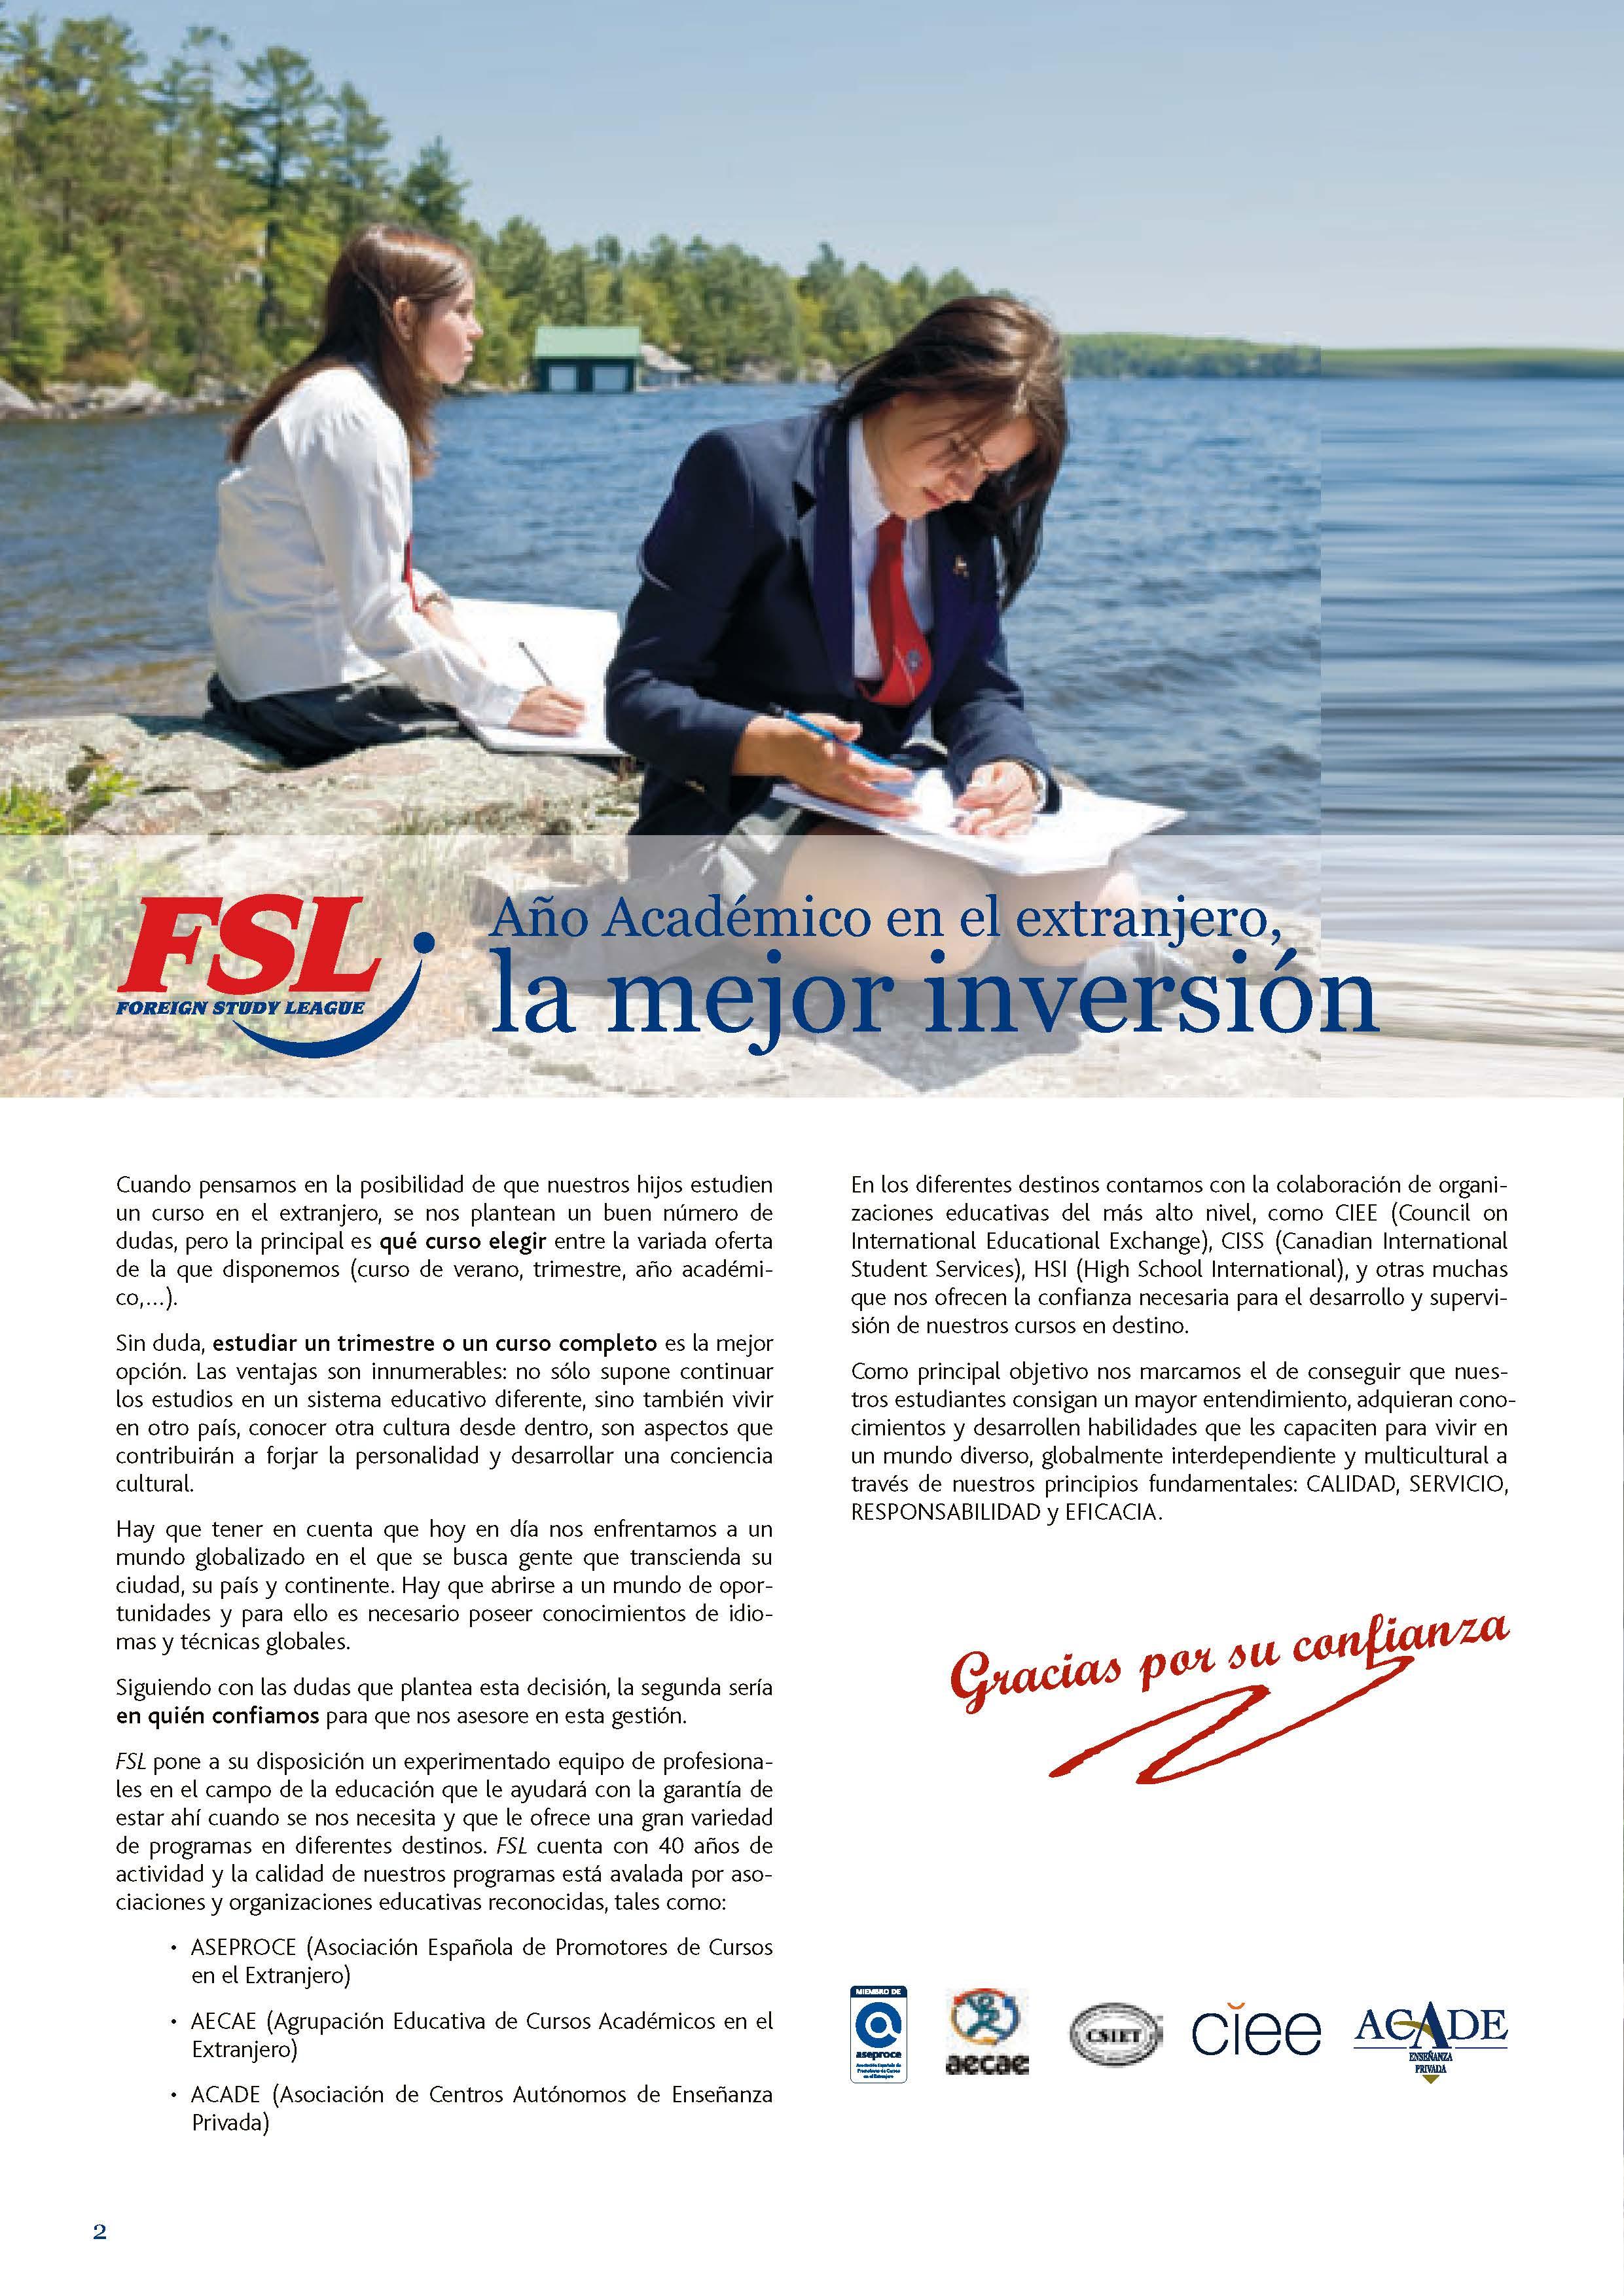 Catalogo FSL (2).jpg